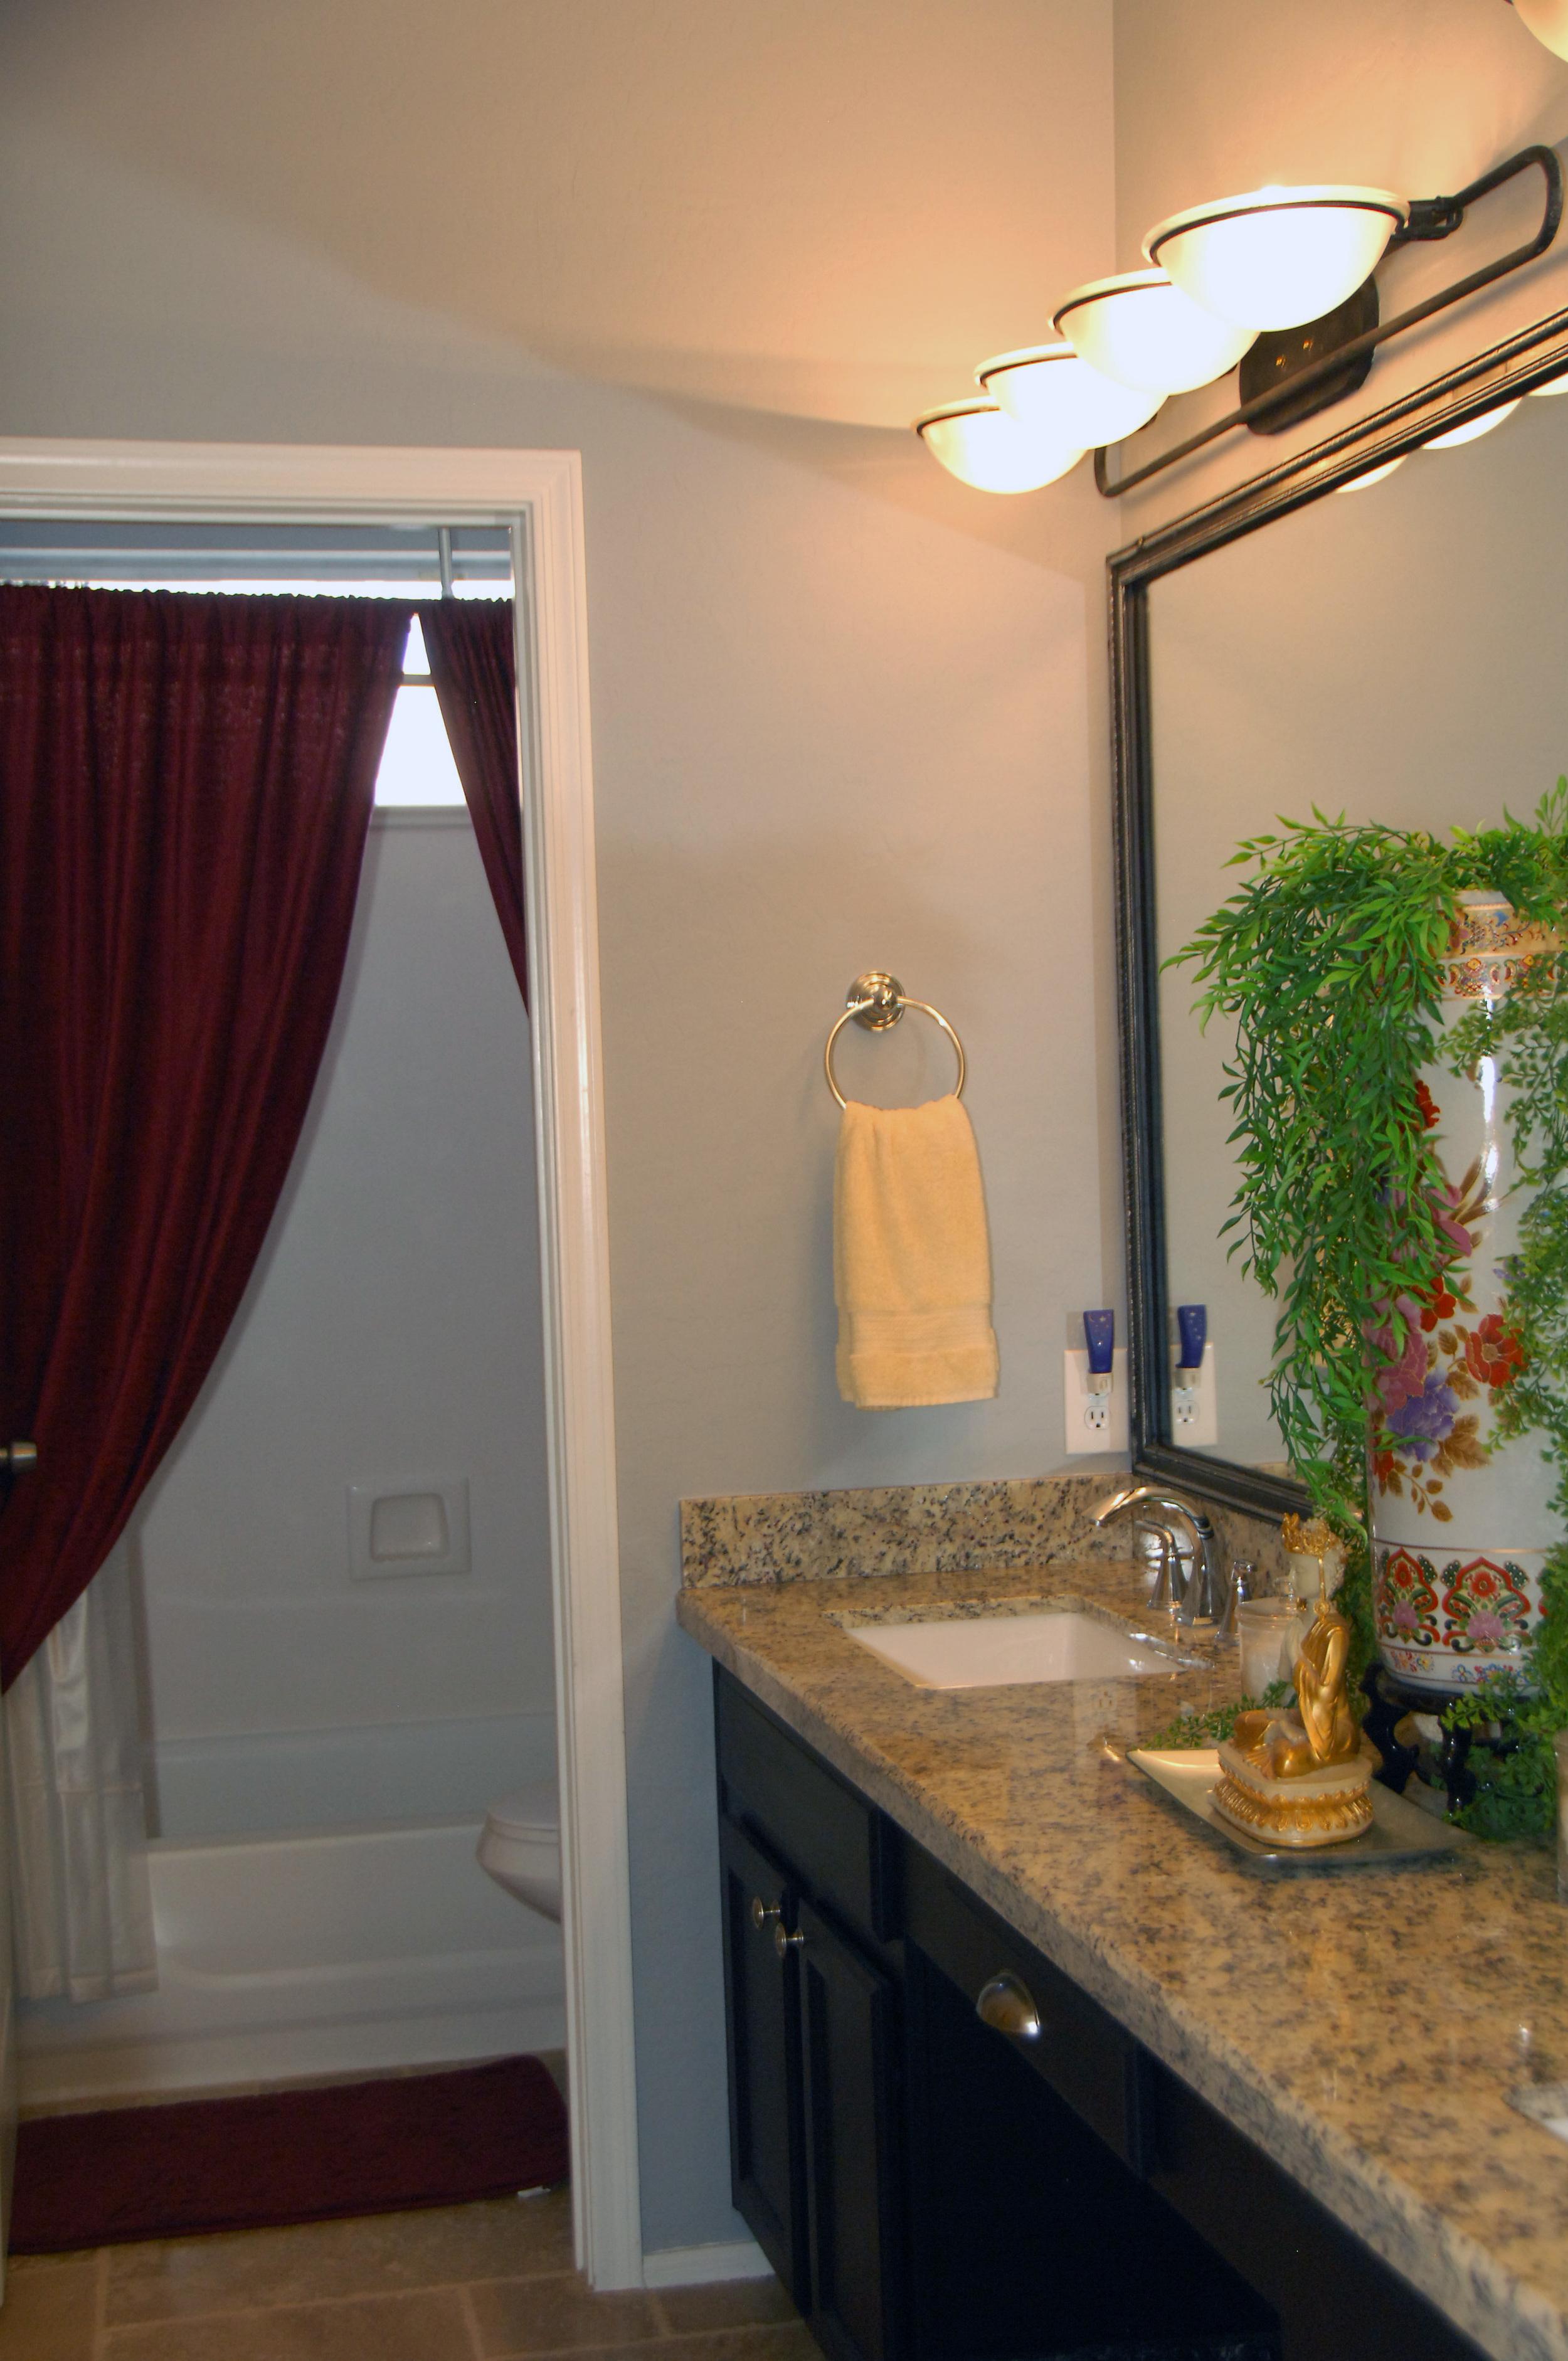 Bathroom number 2 photo 1.JPG